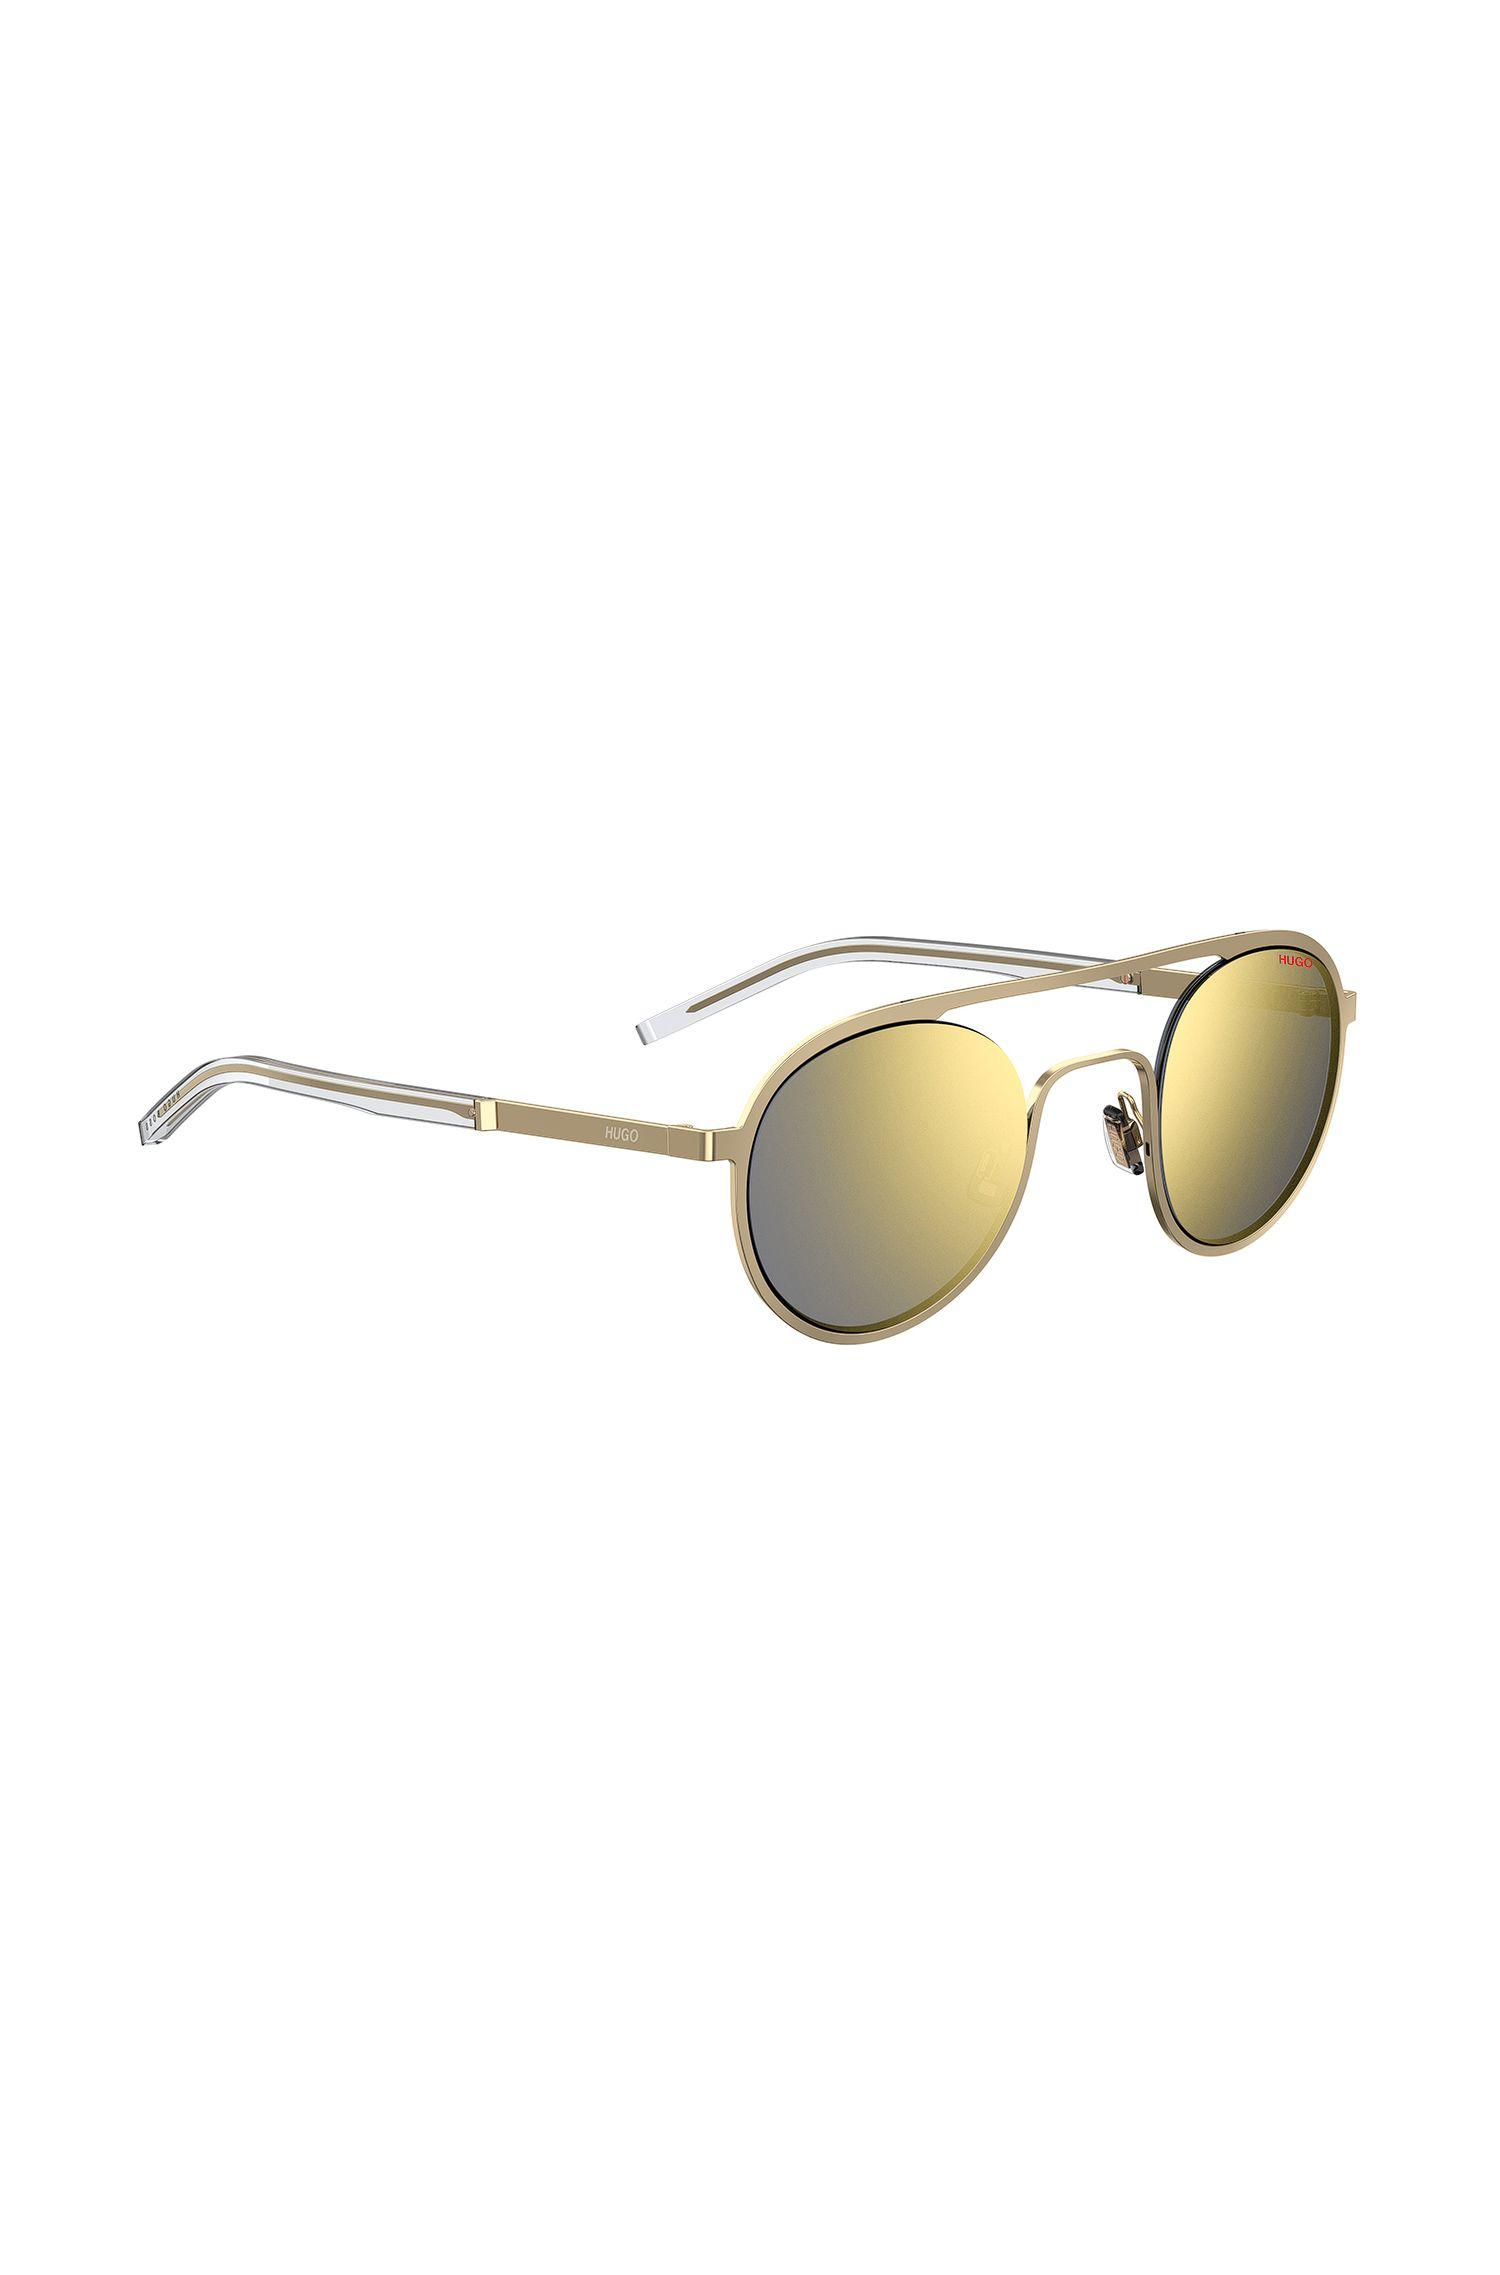 Unisex gold-tone sunglasses with double bridge, Gold